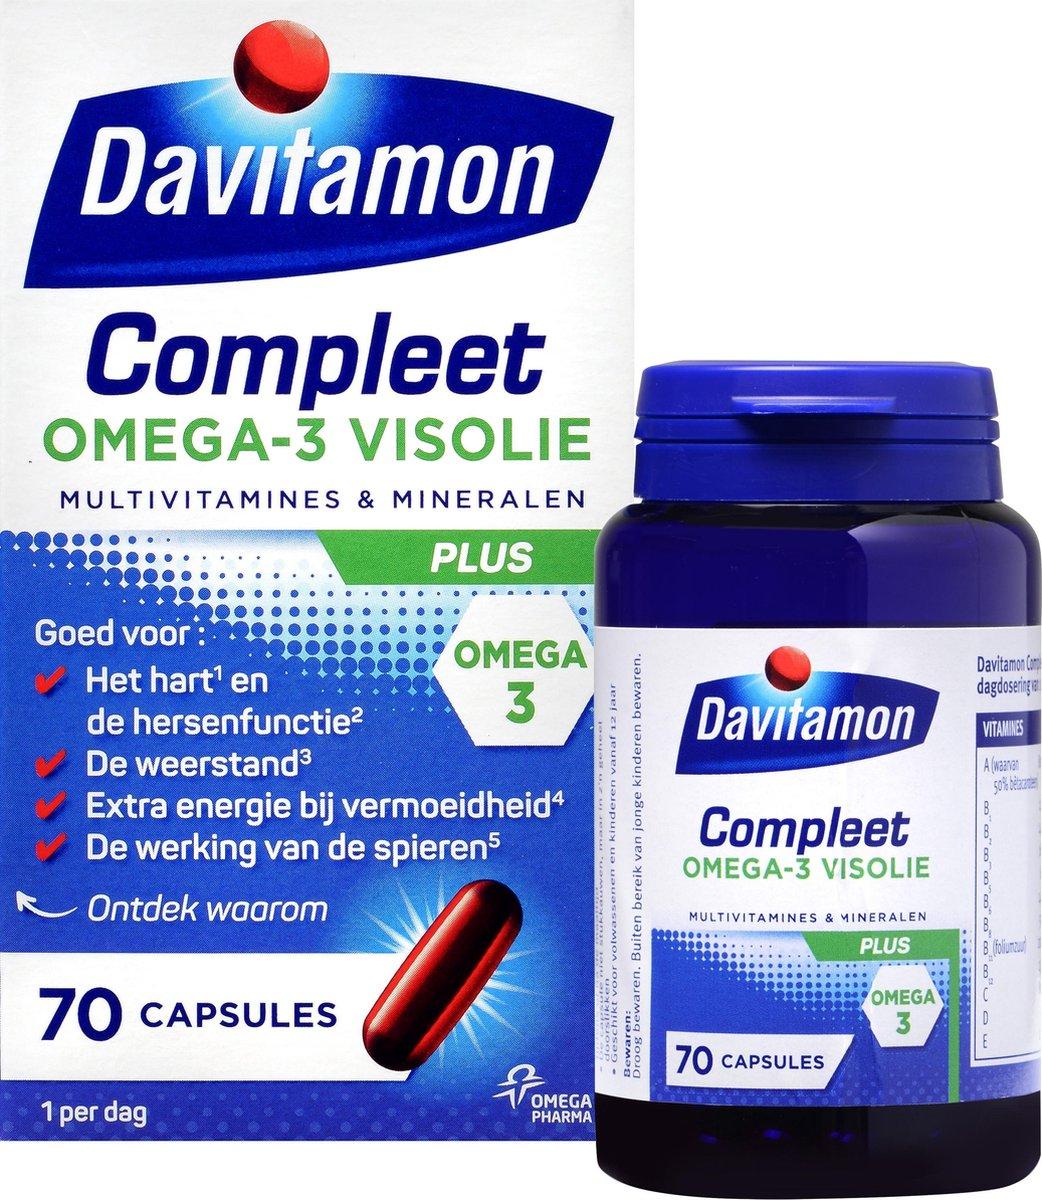 Davitamon Compleet + Omega 3 Visolie - Multivitamine - Voedingssupplement - 70 Capsules